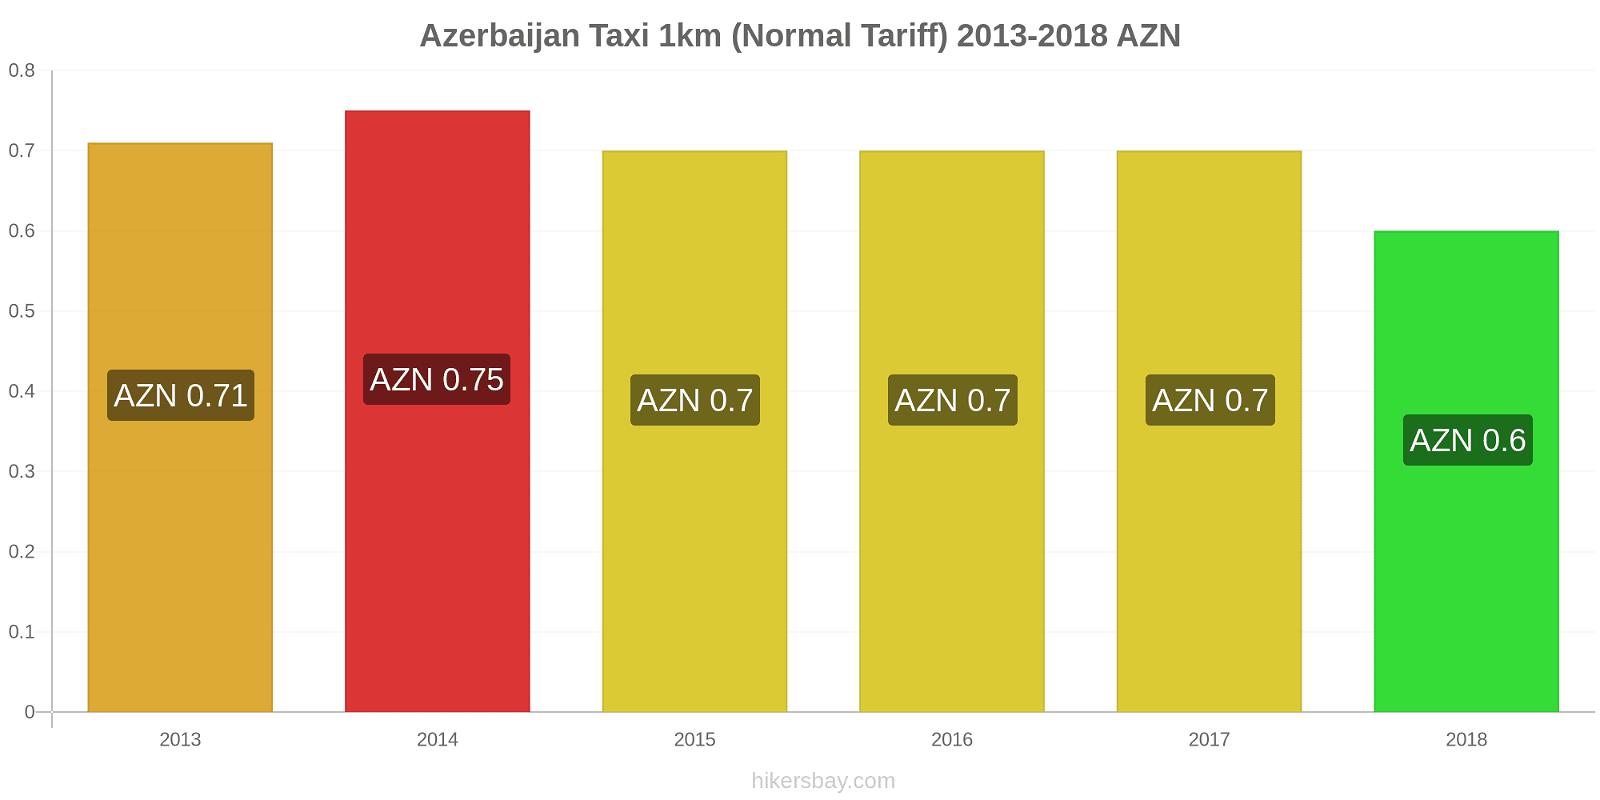 Azerbaijan price changes Taxi 1km (Normal Tariff) hikersbay.com